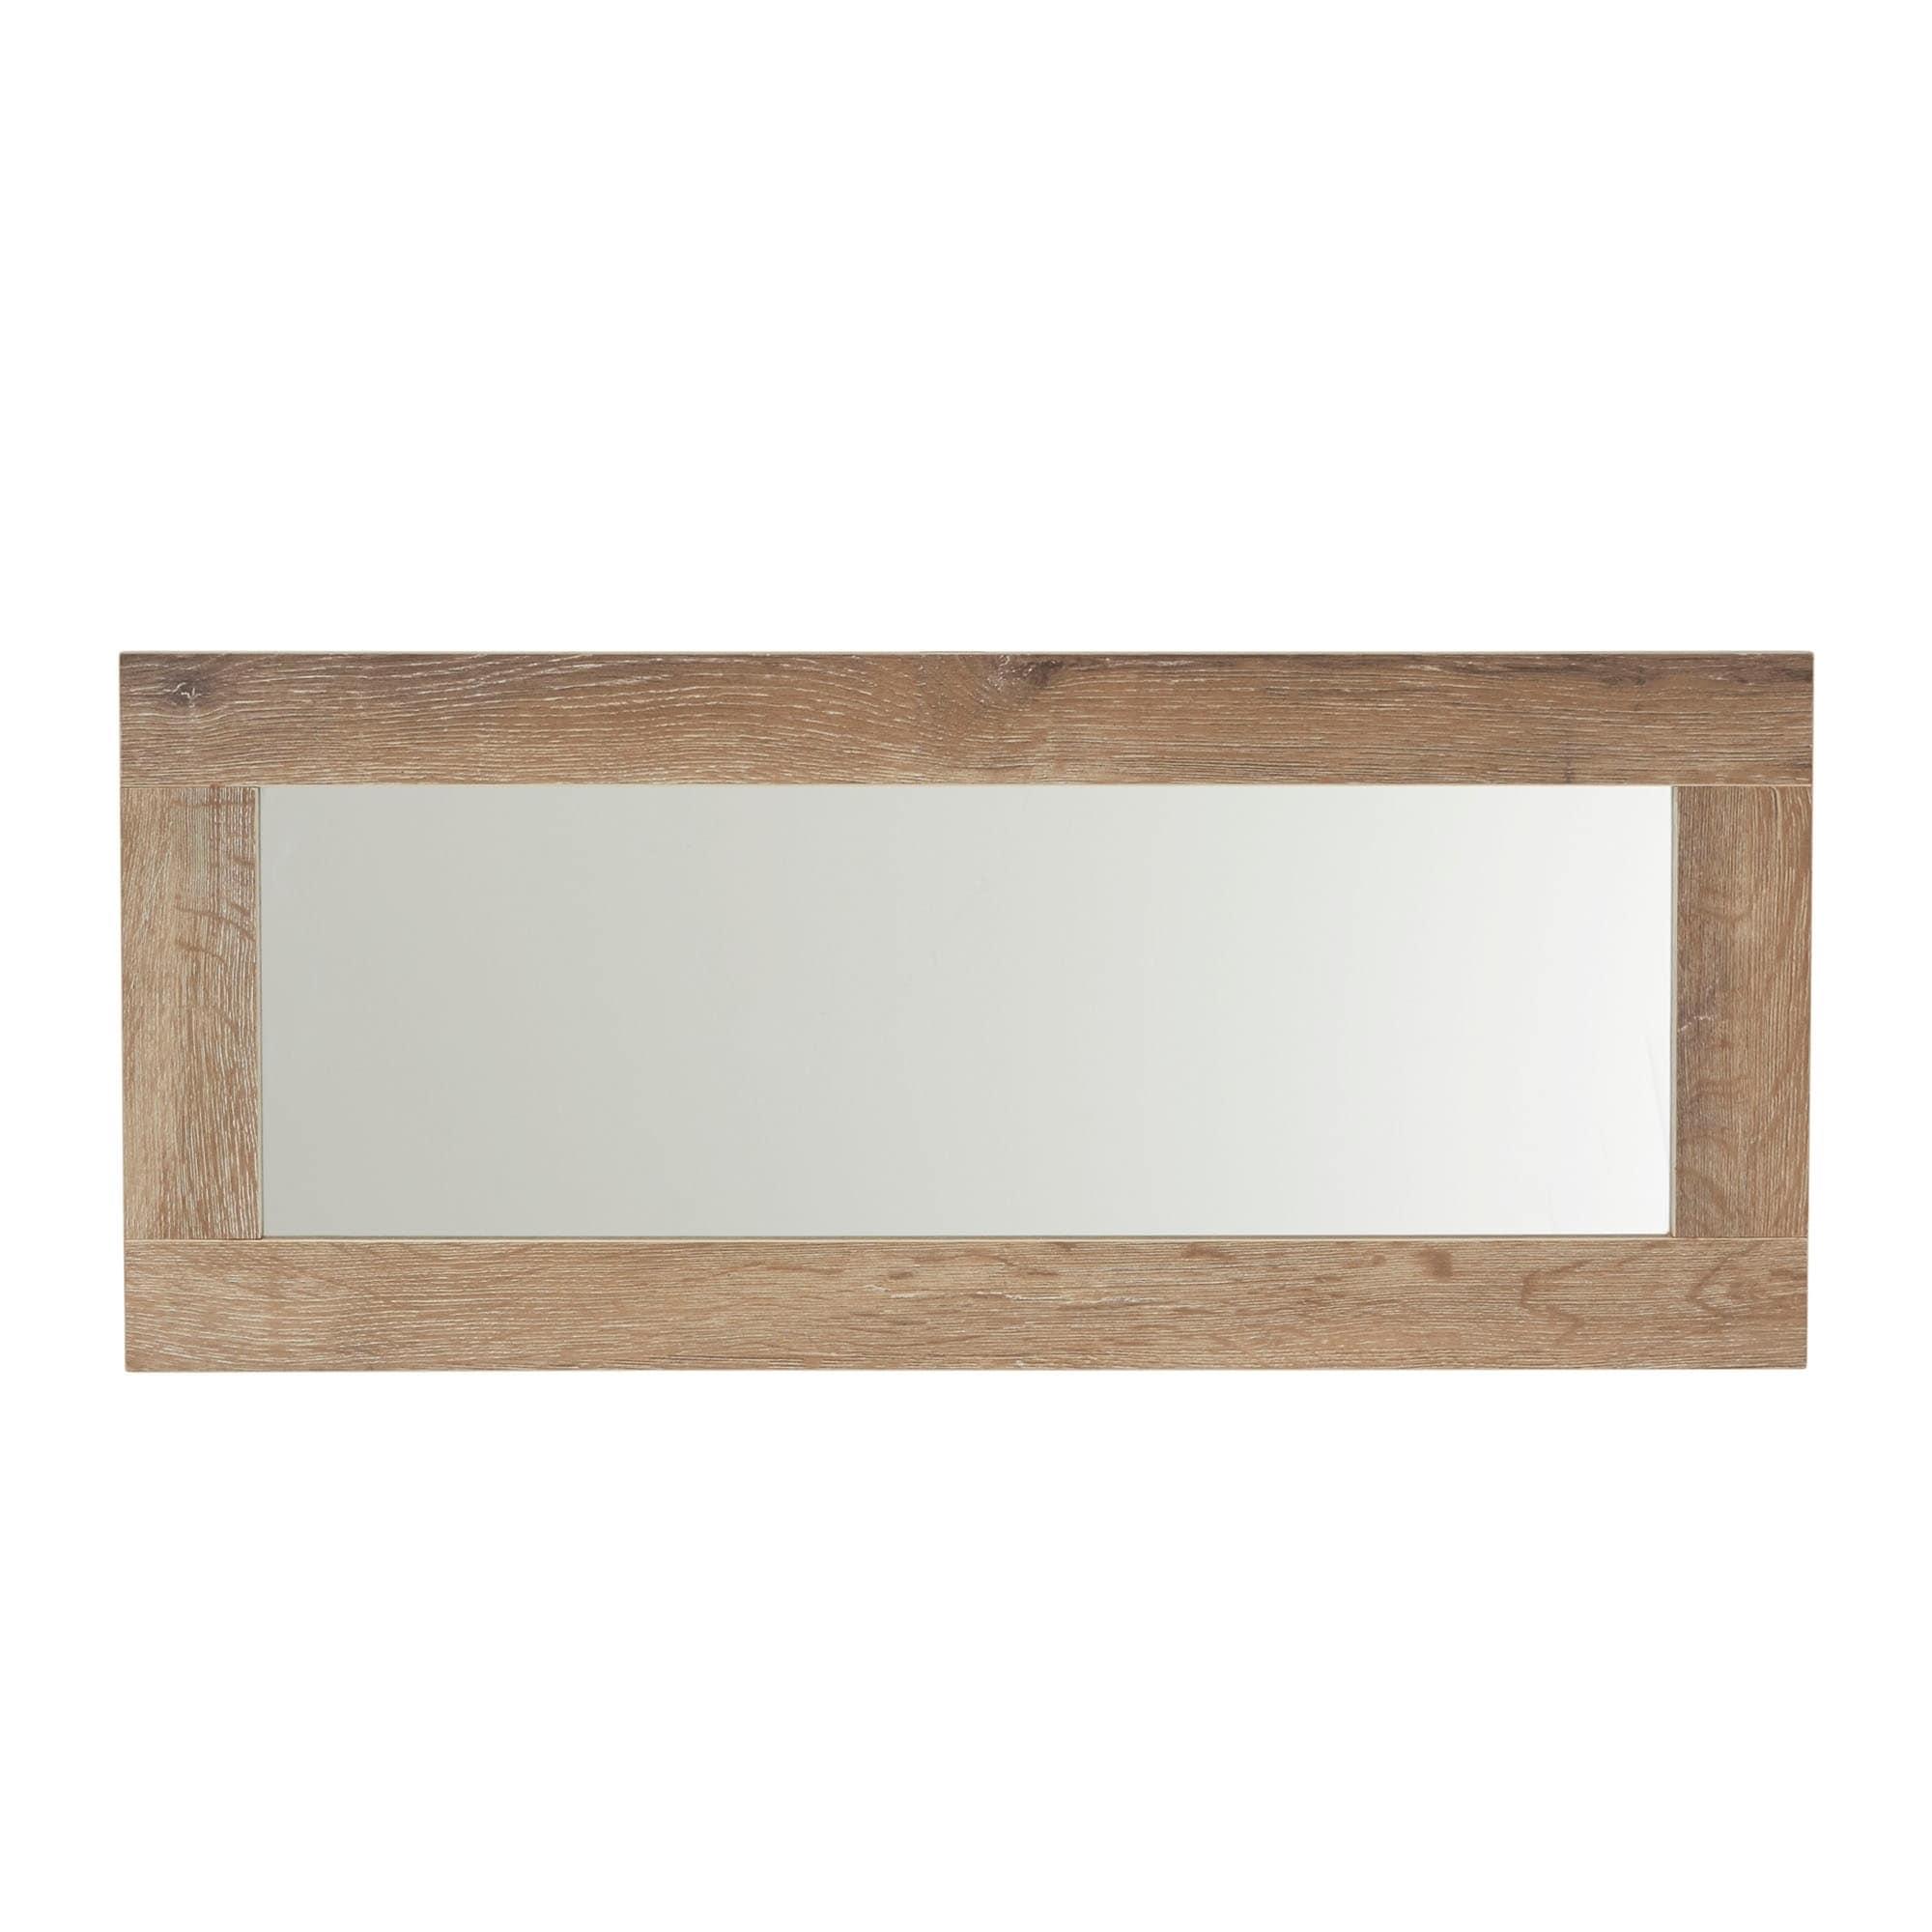 Household Essentials Decorative Wall Mirror, Ashwood